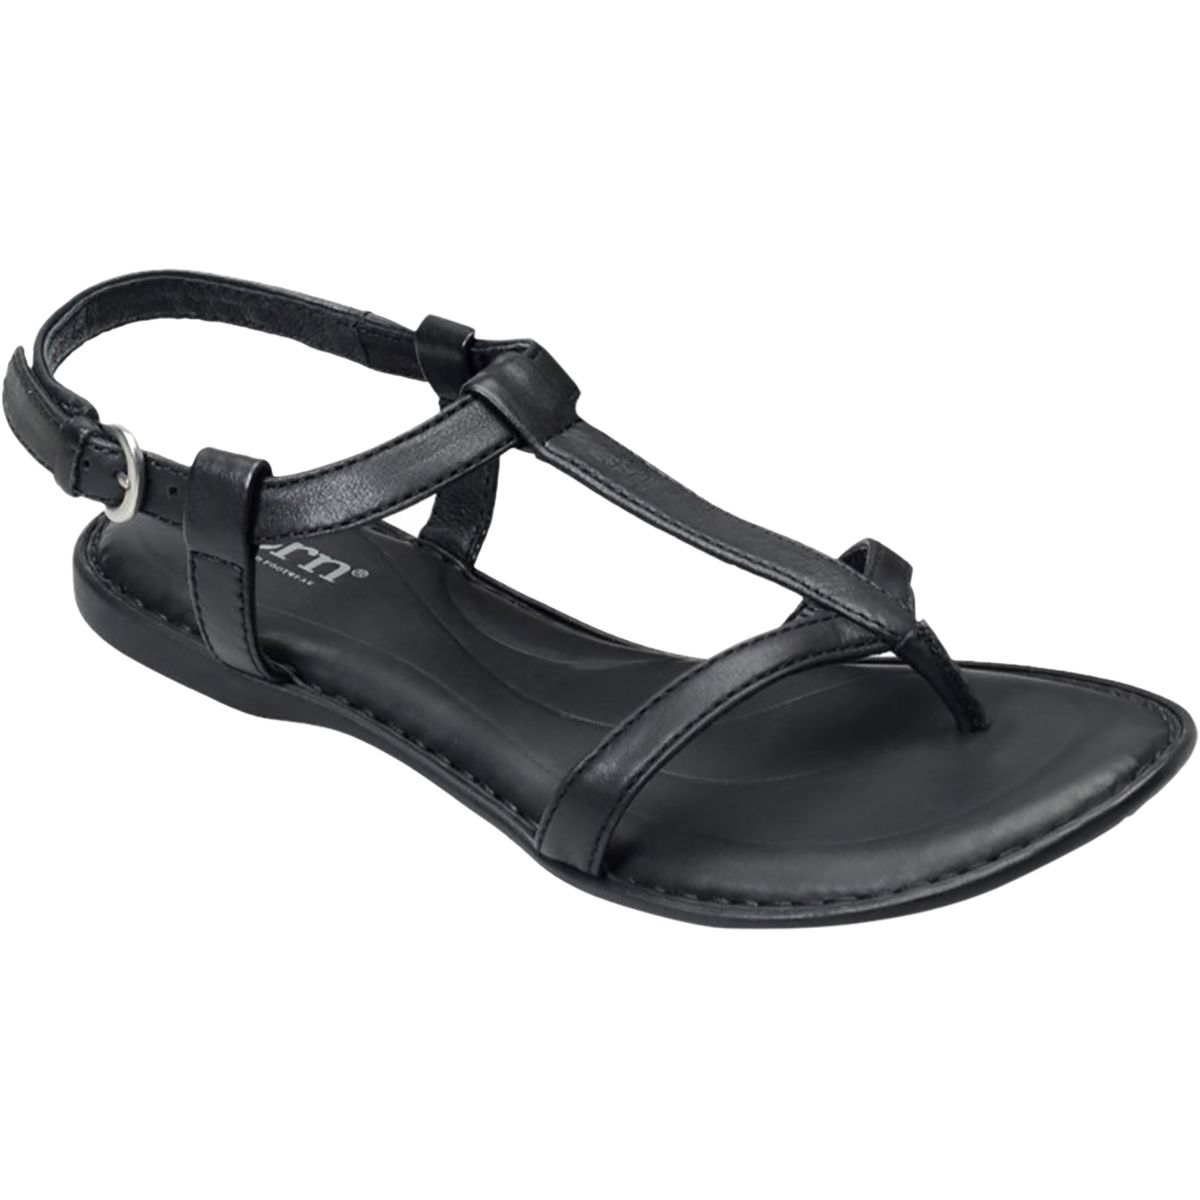 9bfe7b61a397 Born Shoes Idina Sandal Womens Black 60